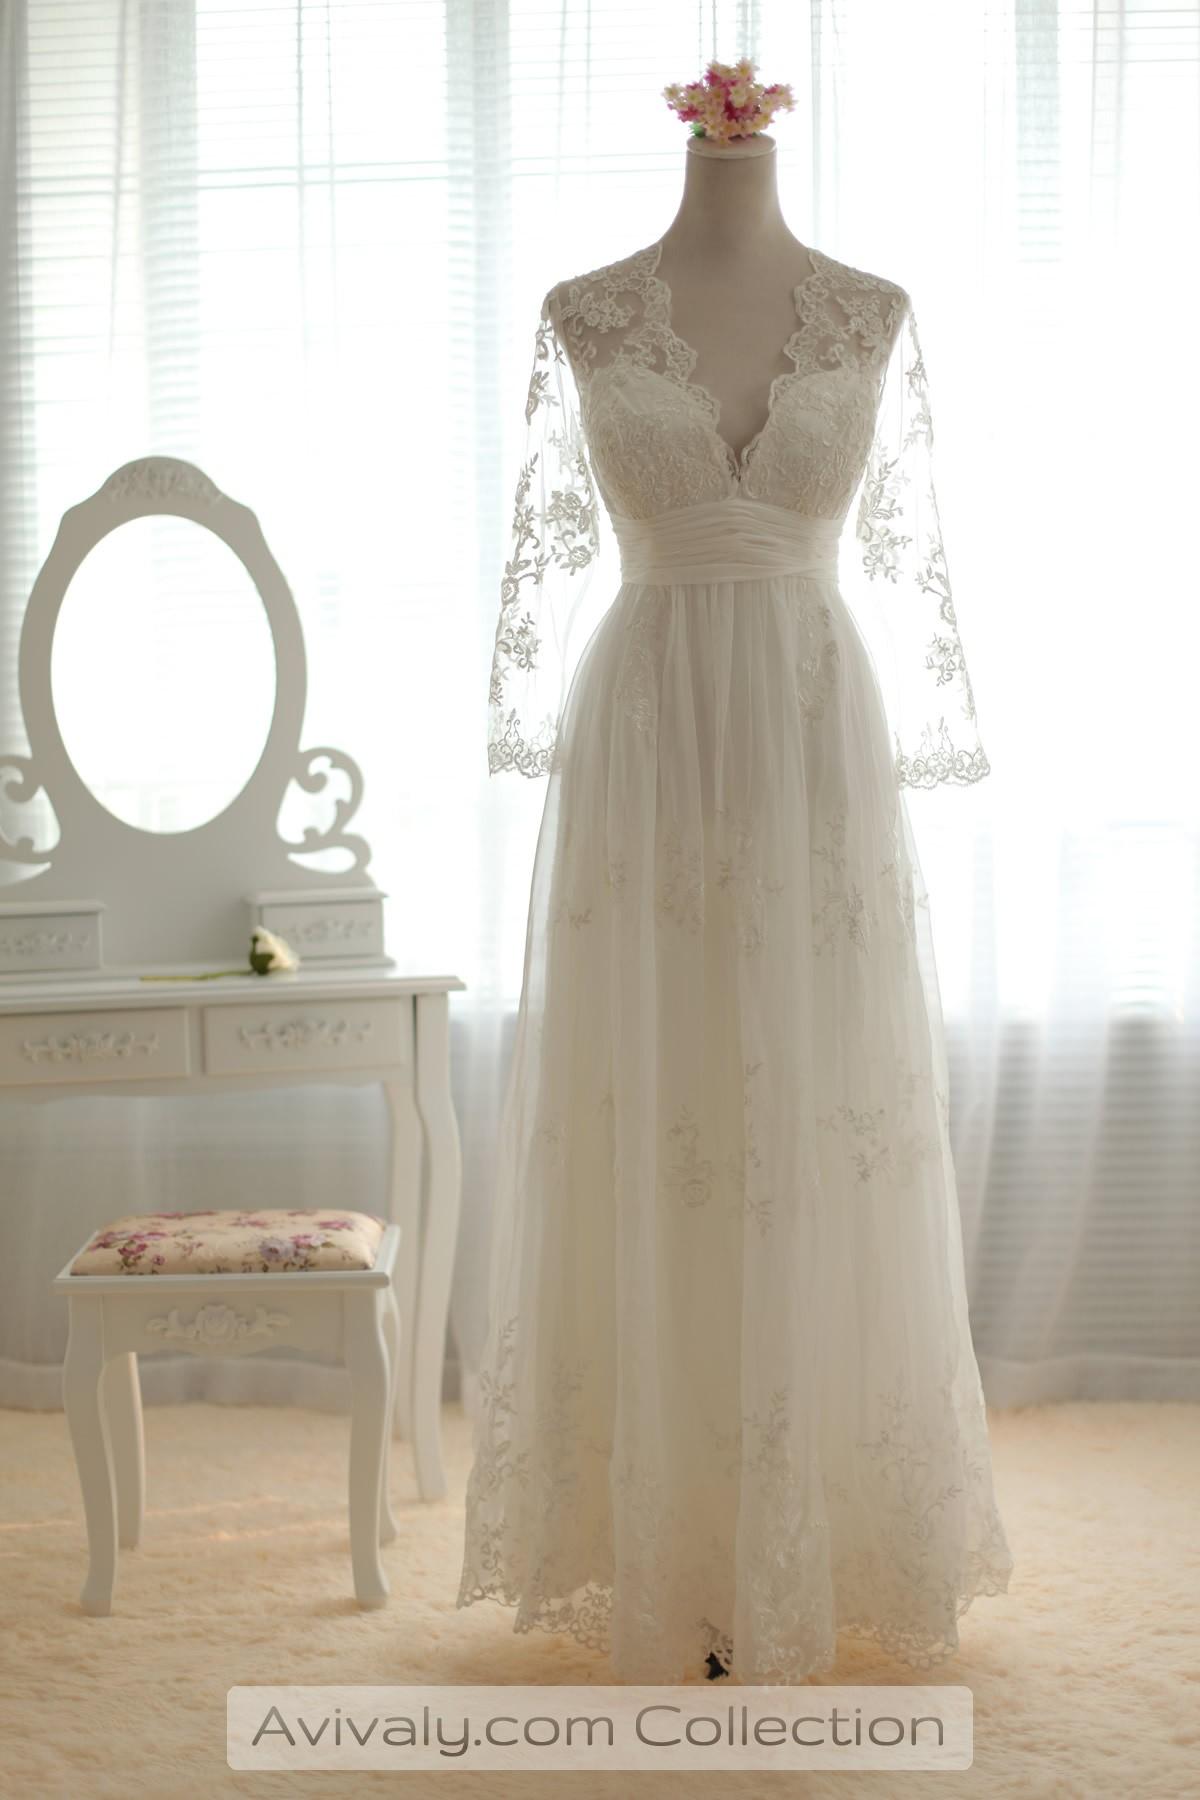 Lilian Sheer Long Sleeves Floral Lace Wedding Dress